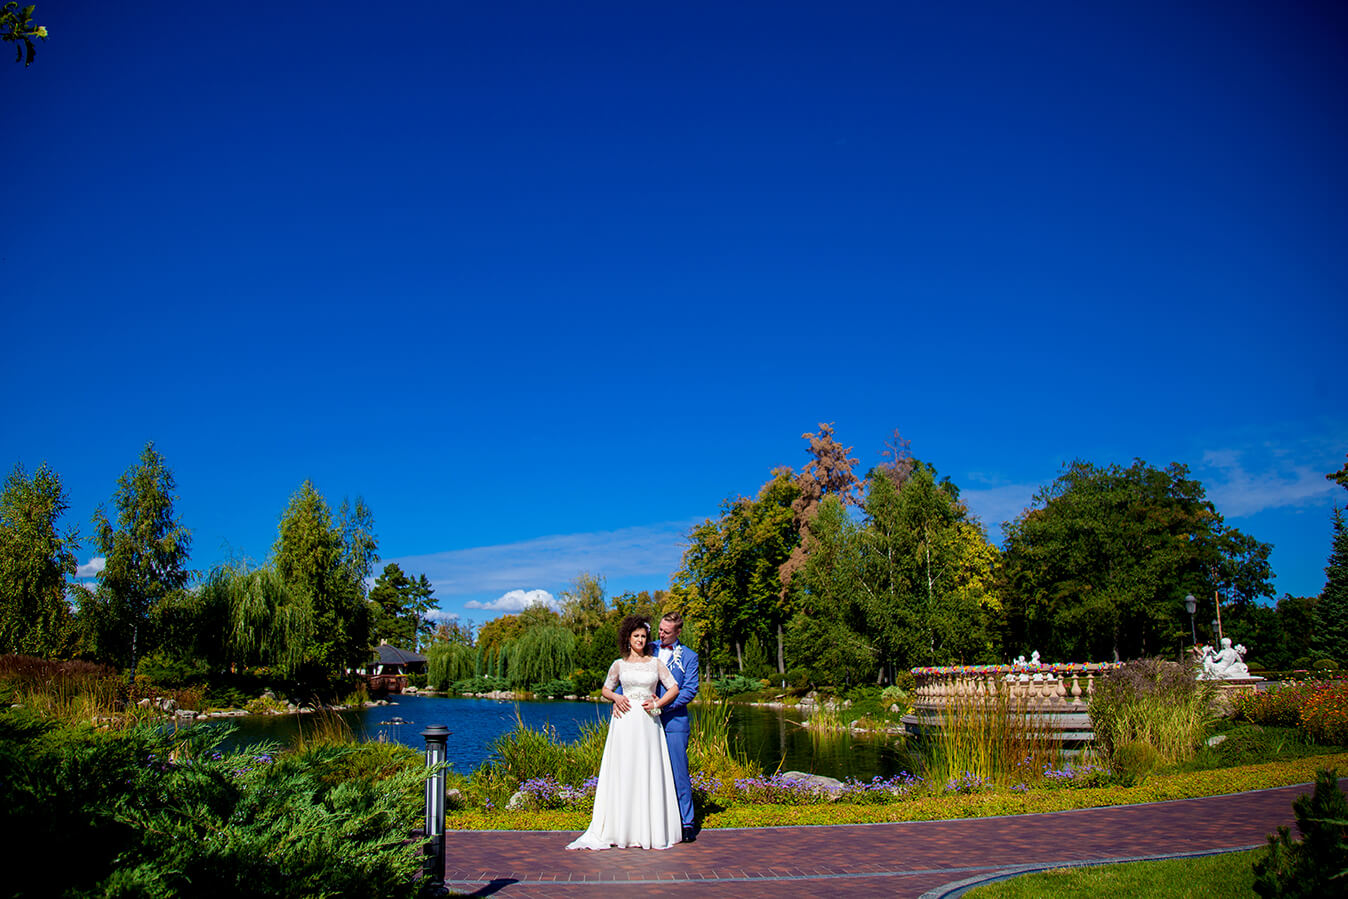 3-svadebnyj-fotograf-videooperator-svadebnoe-foto-idei-kiev-27